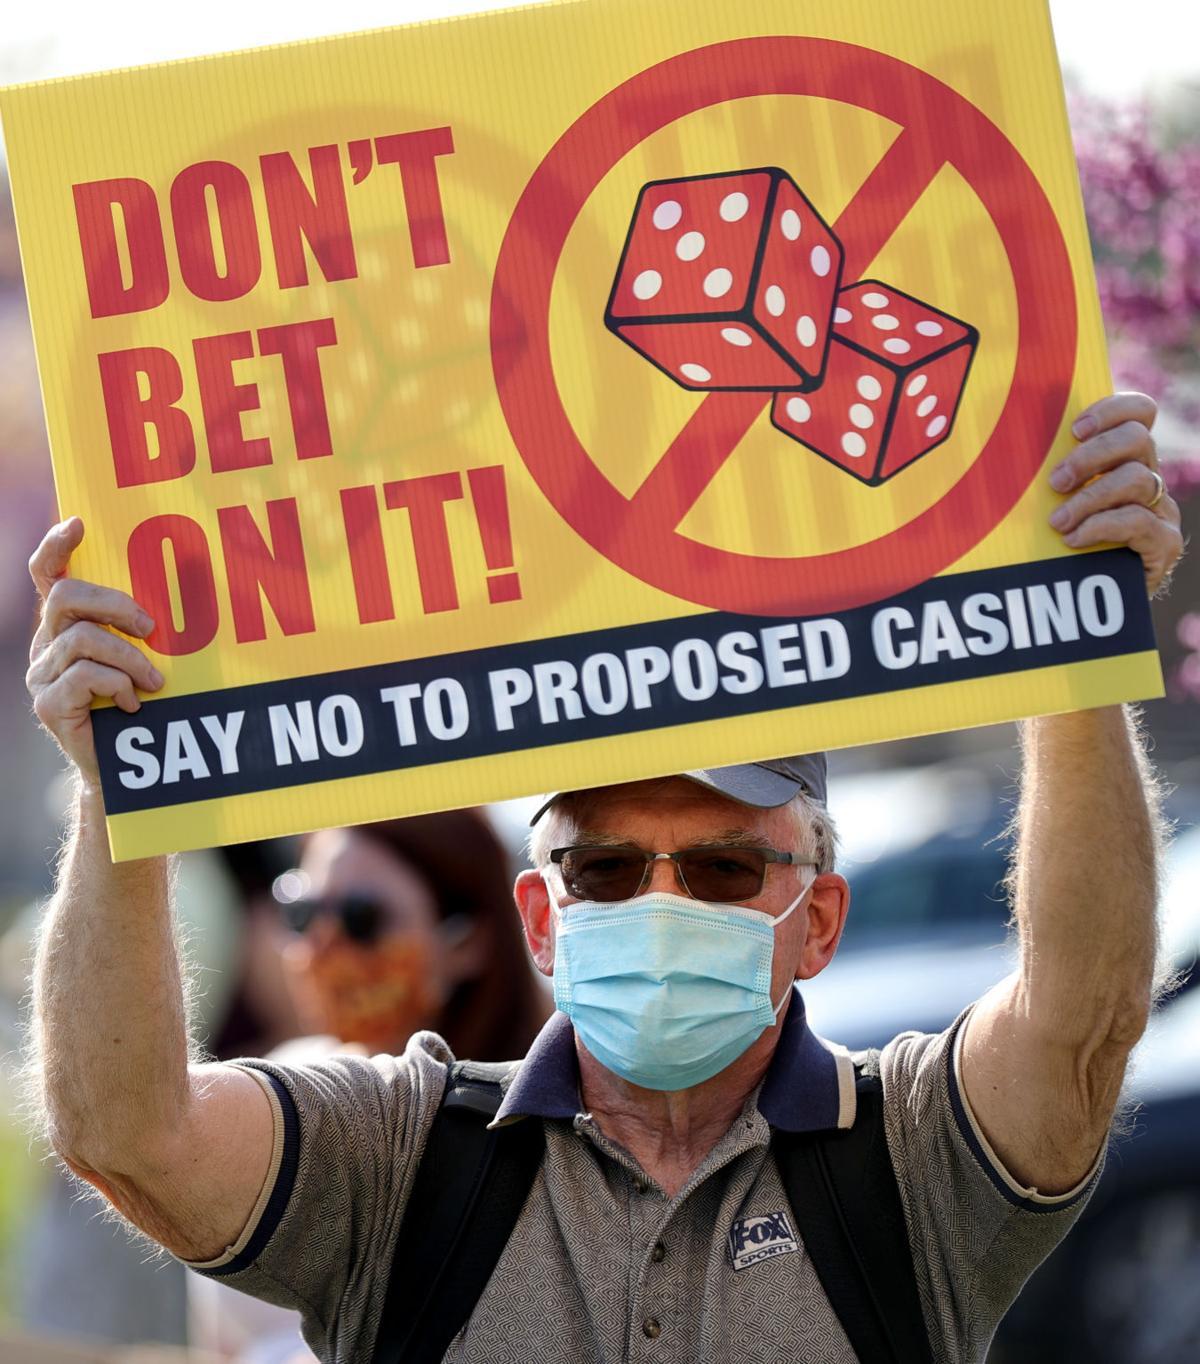 Casino in Stratford Hills